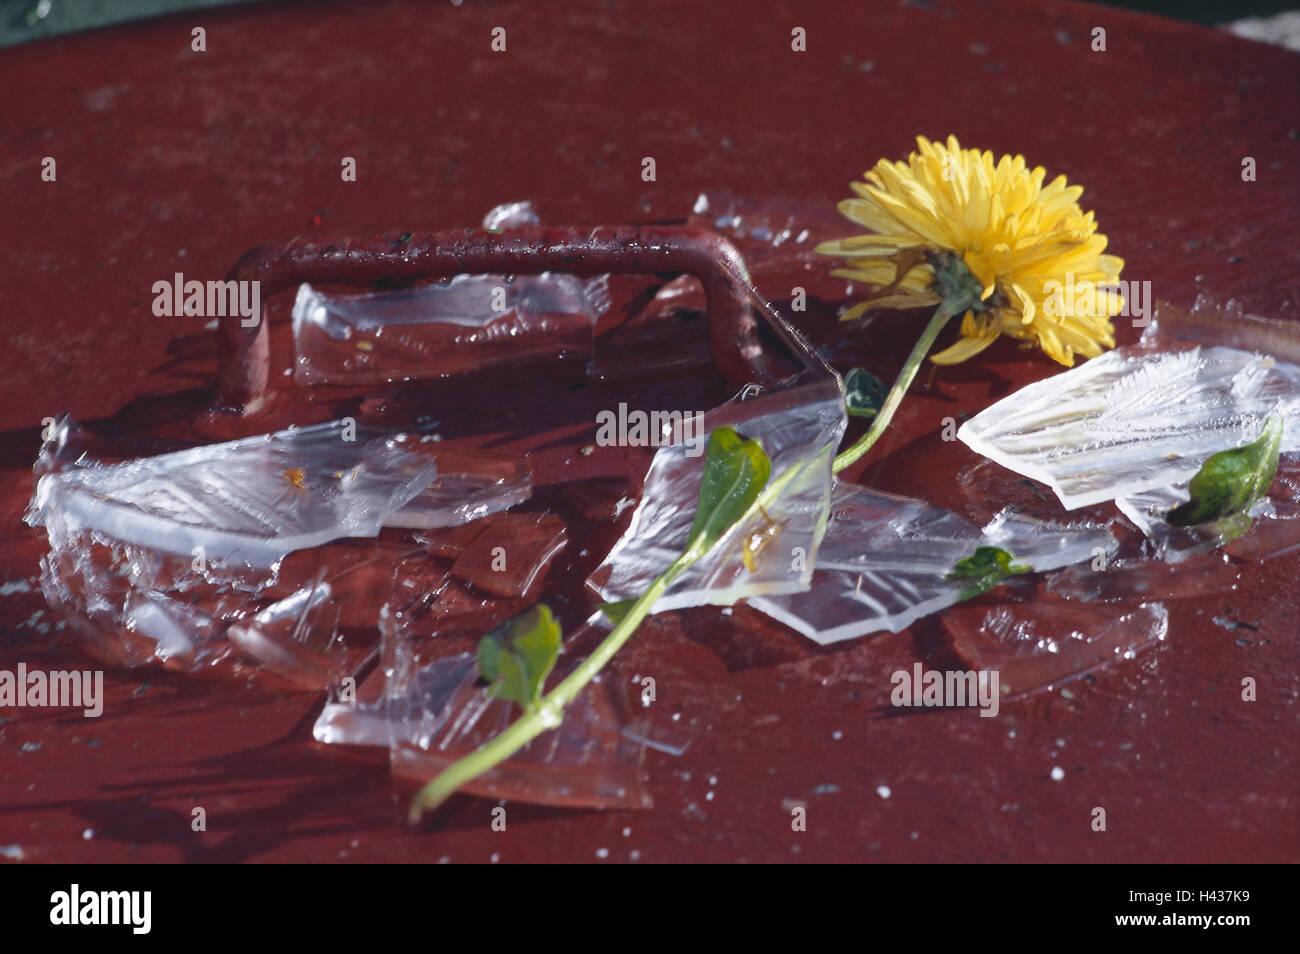 Vase broken stock photos vase broken stock images alamy blossom chrysanthemum glass vase broken shards lie flower cut reviewsmspy